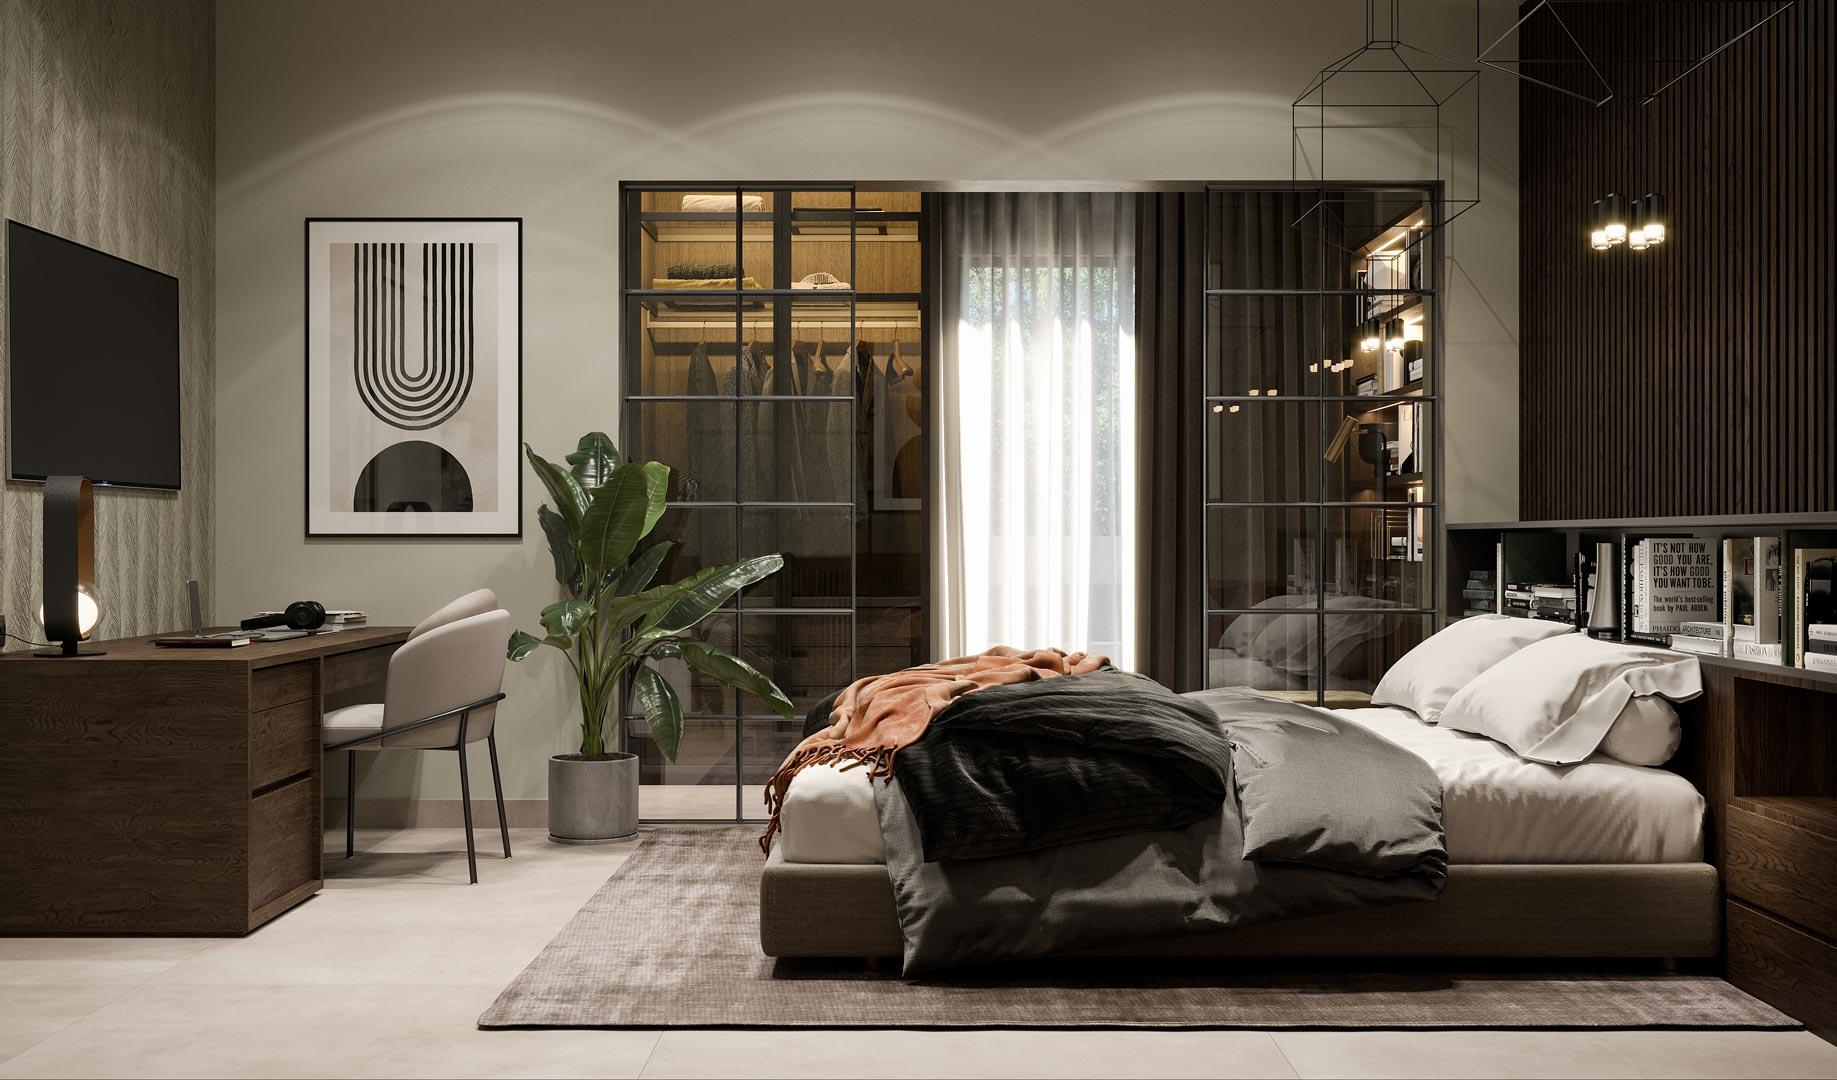 Bedroom by Xenia Liodi